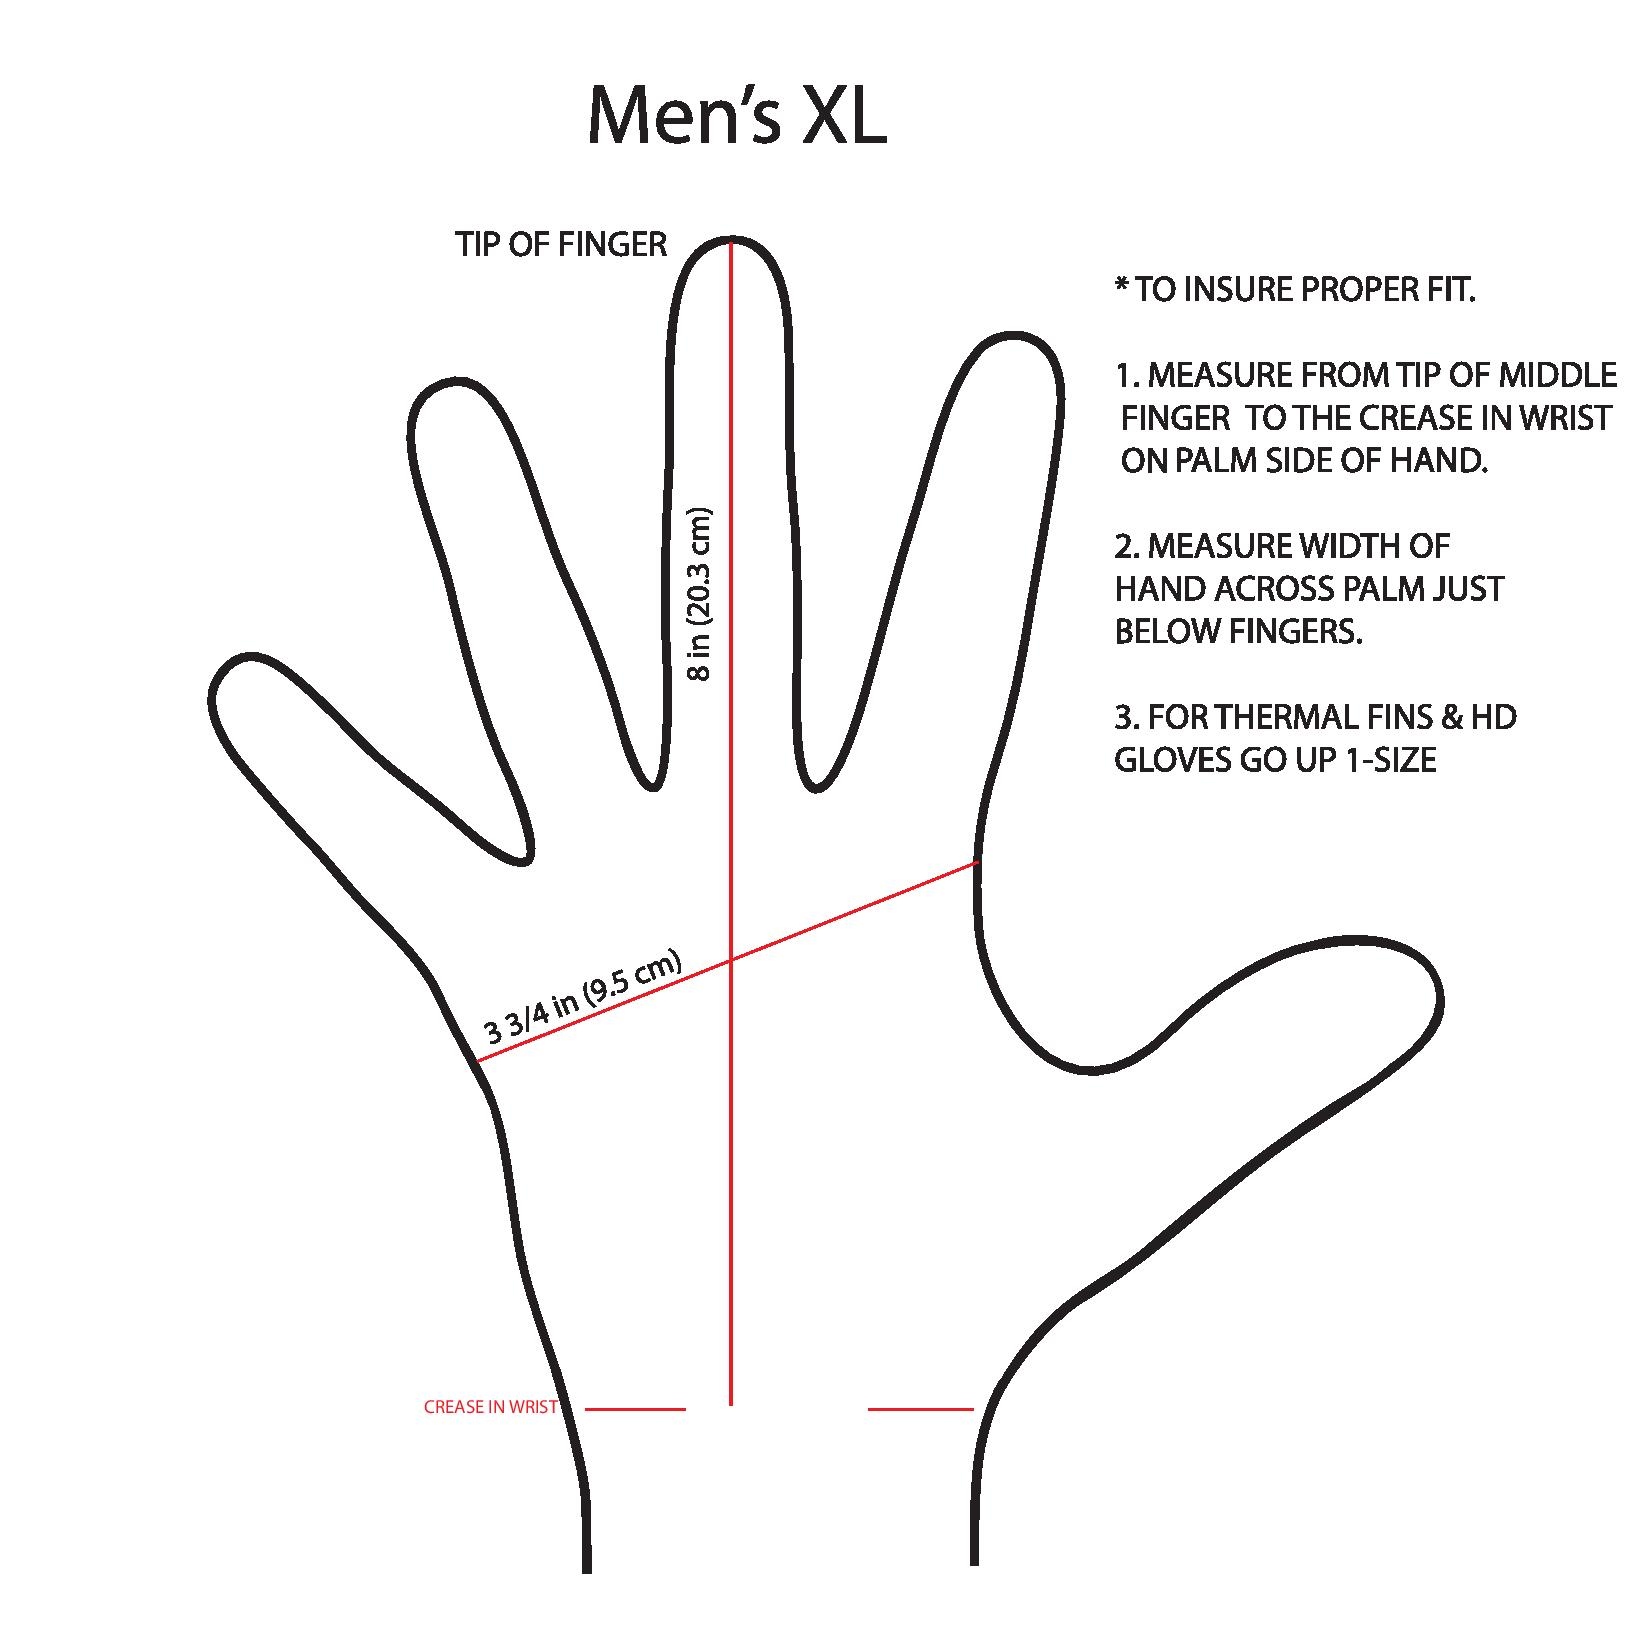 men-s-xl-page-001-2-.jpg